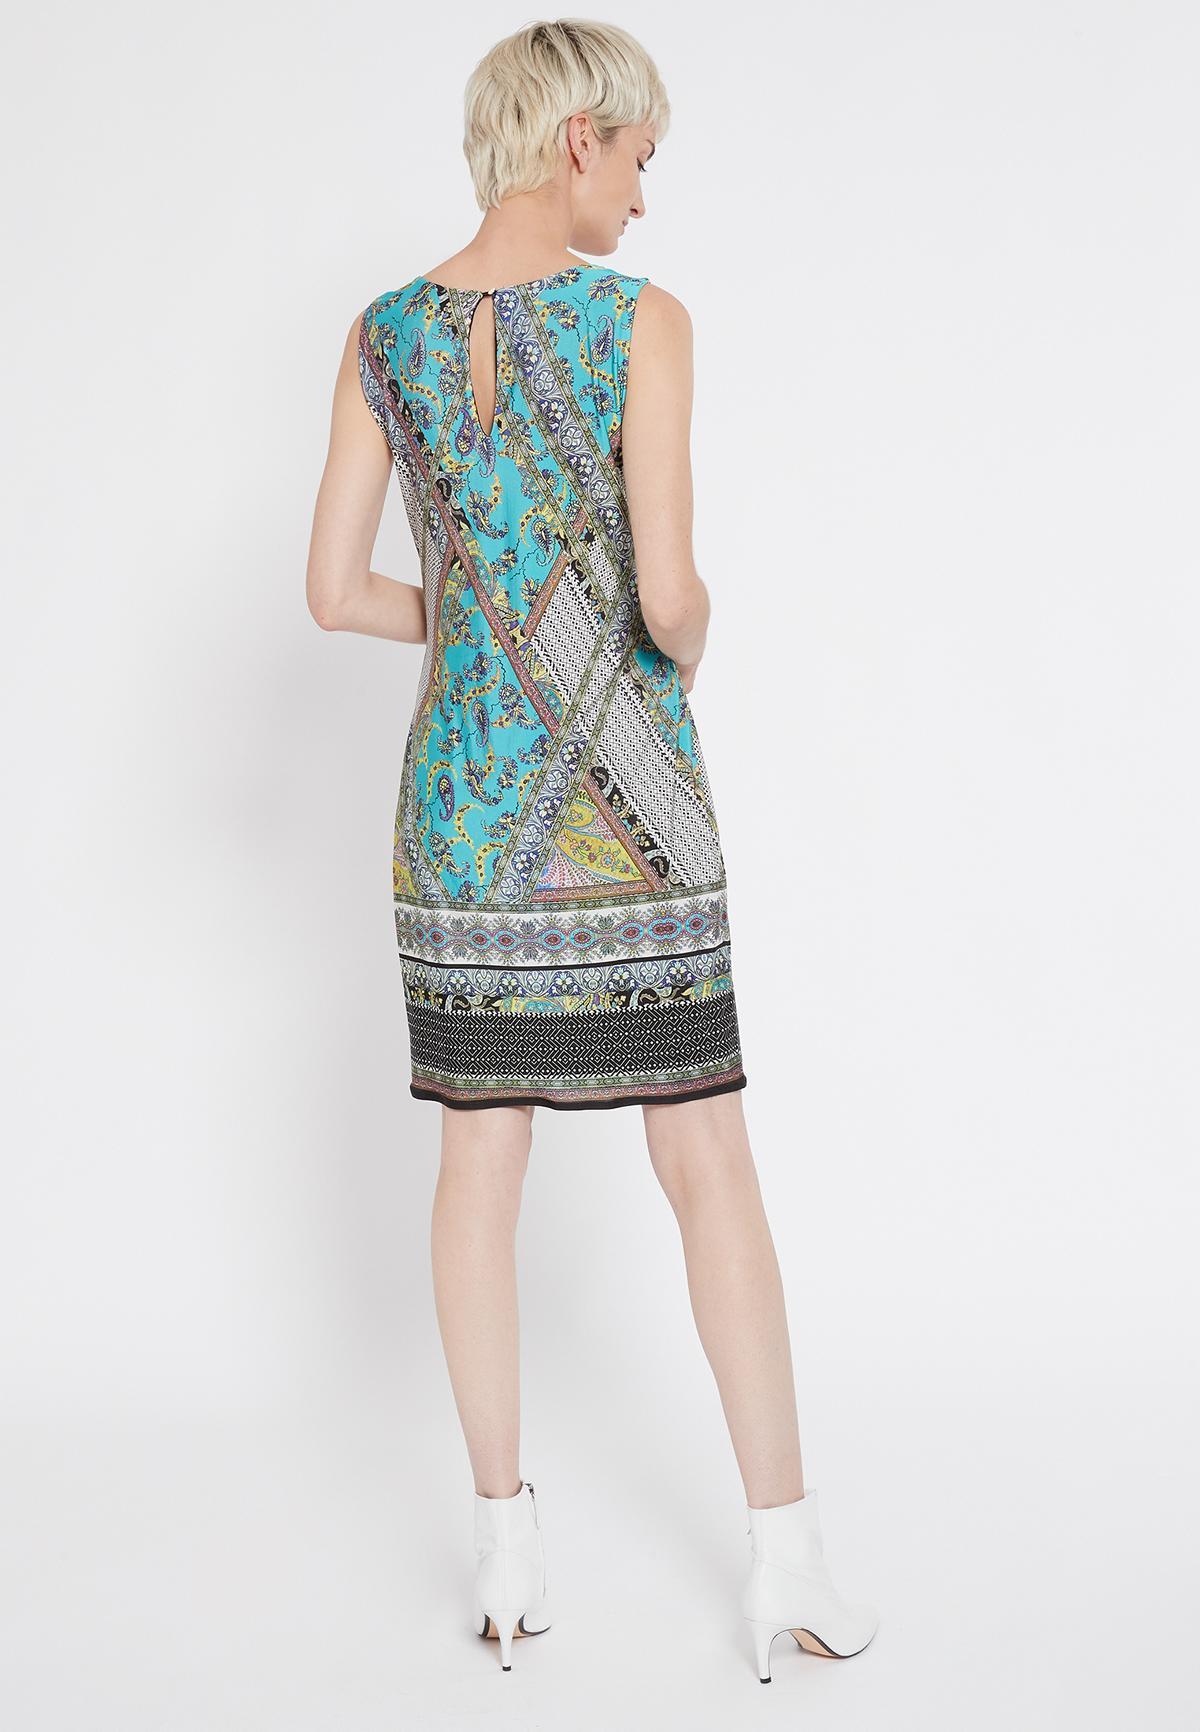 Rückansicht von Ana Alcazar Ärmelloses Kleid Setane  angezogen an Model